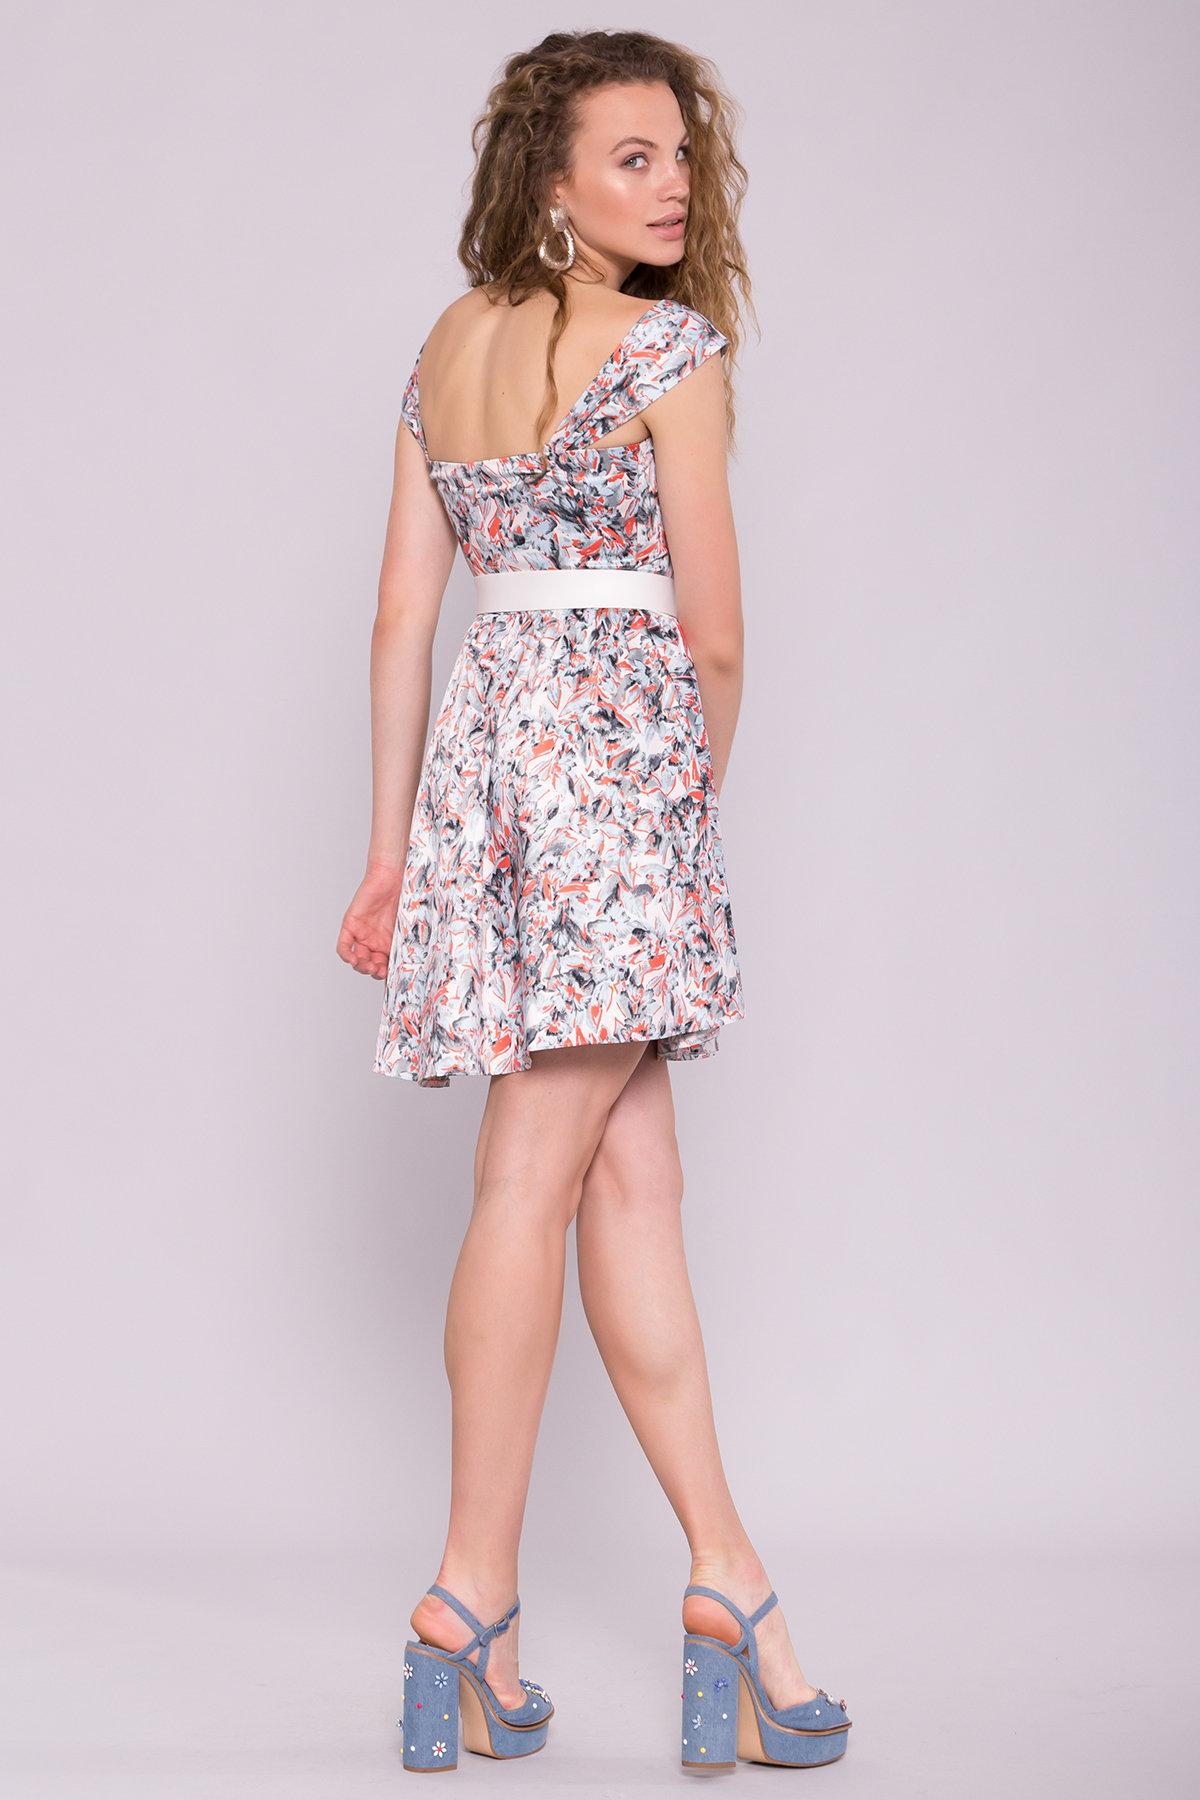 Платье Луиджи 7144 АРТ. 42845 Цвет: голубой/кораллл - фото 4, интернет магазин tm-modus.ru